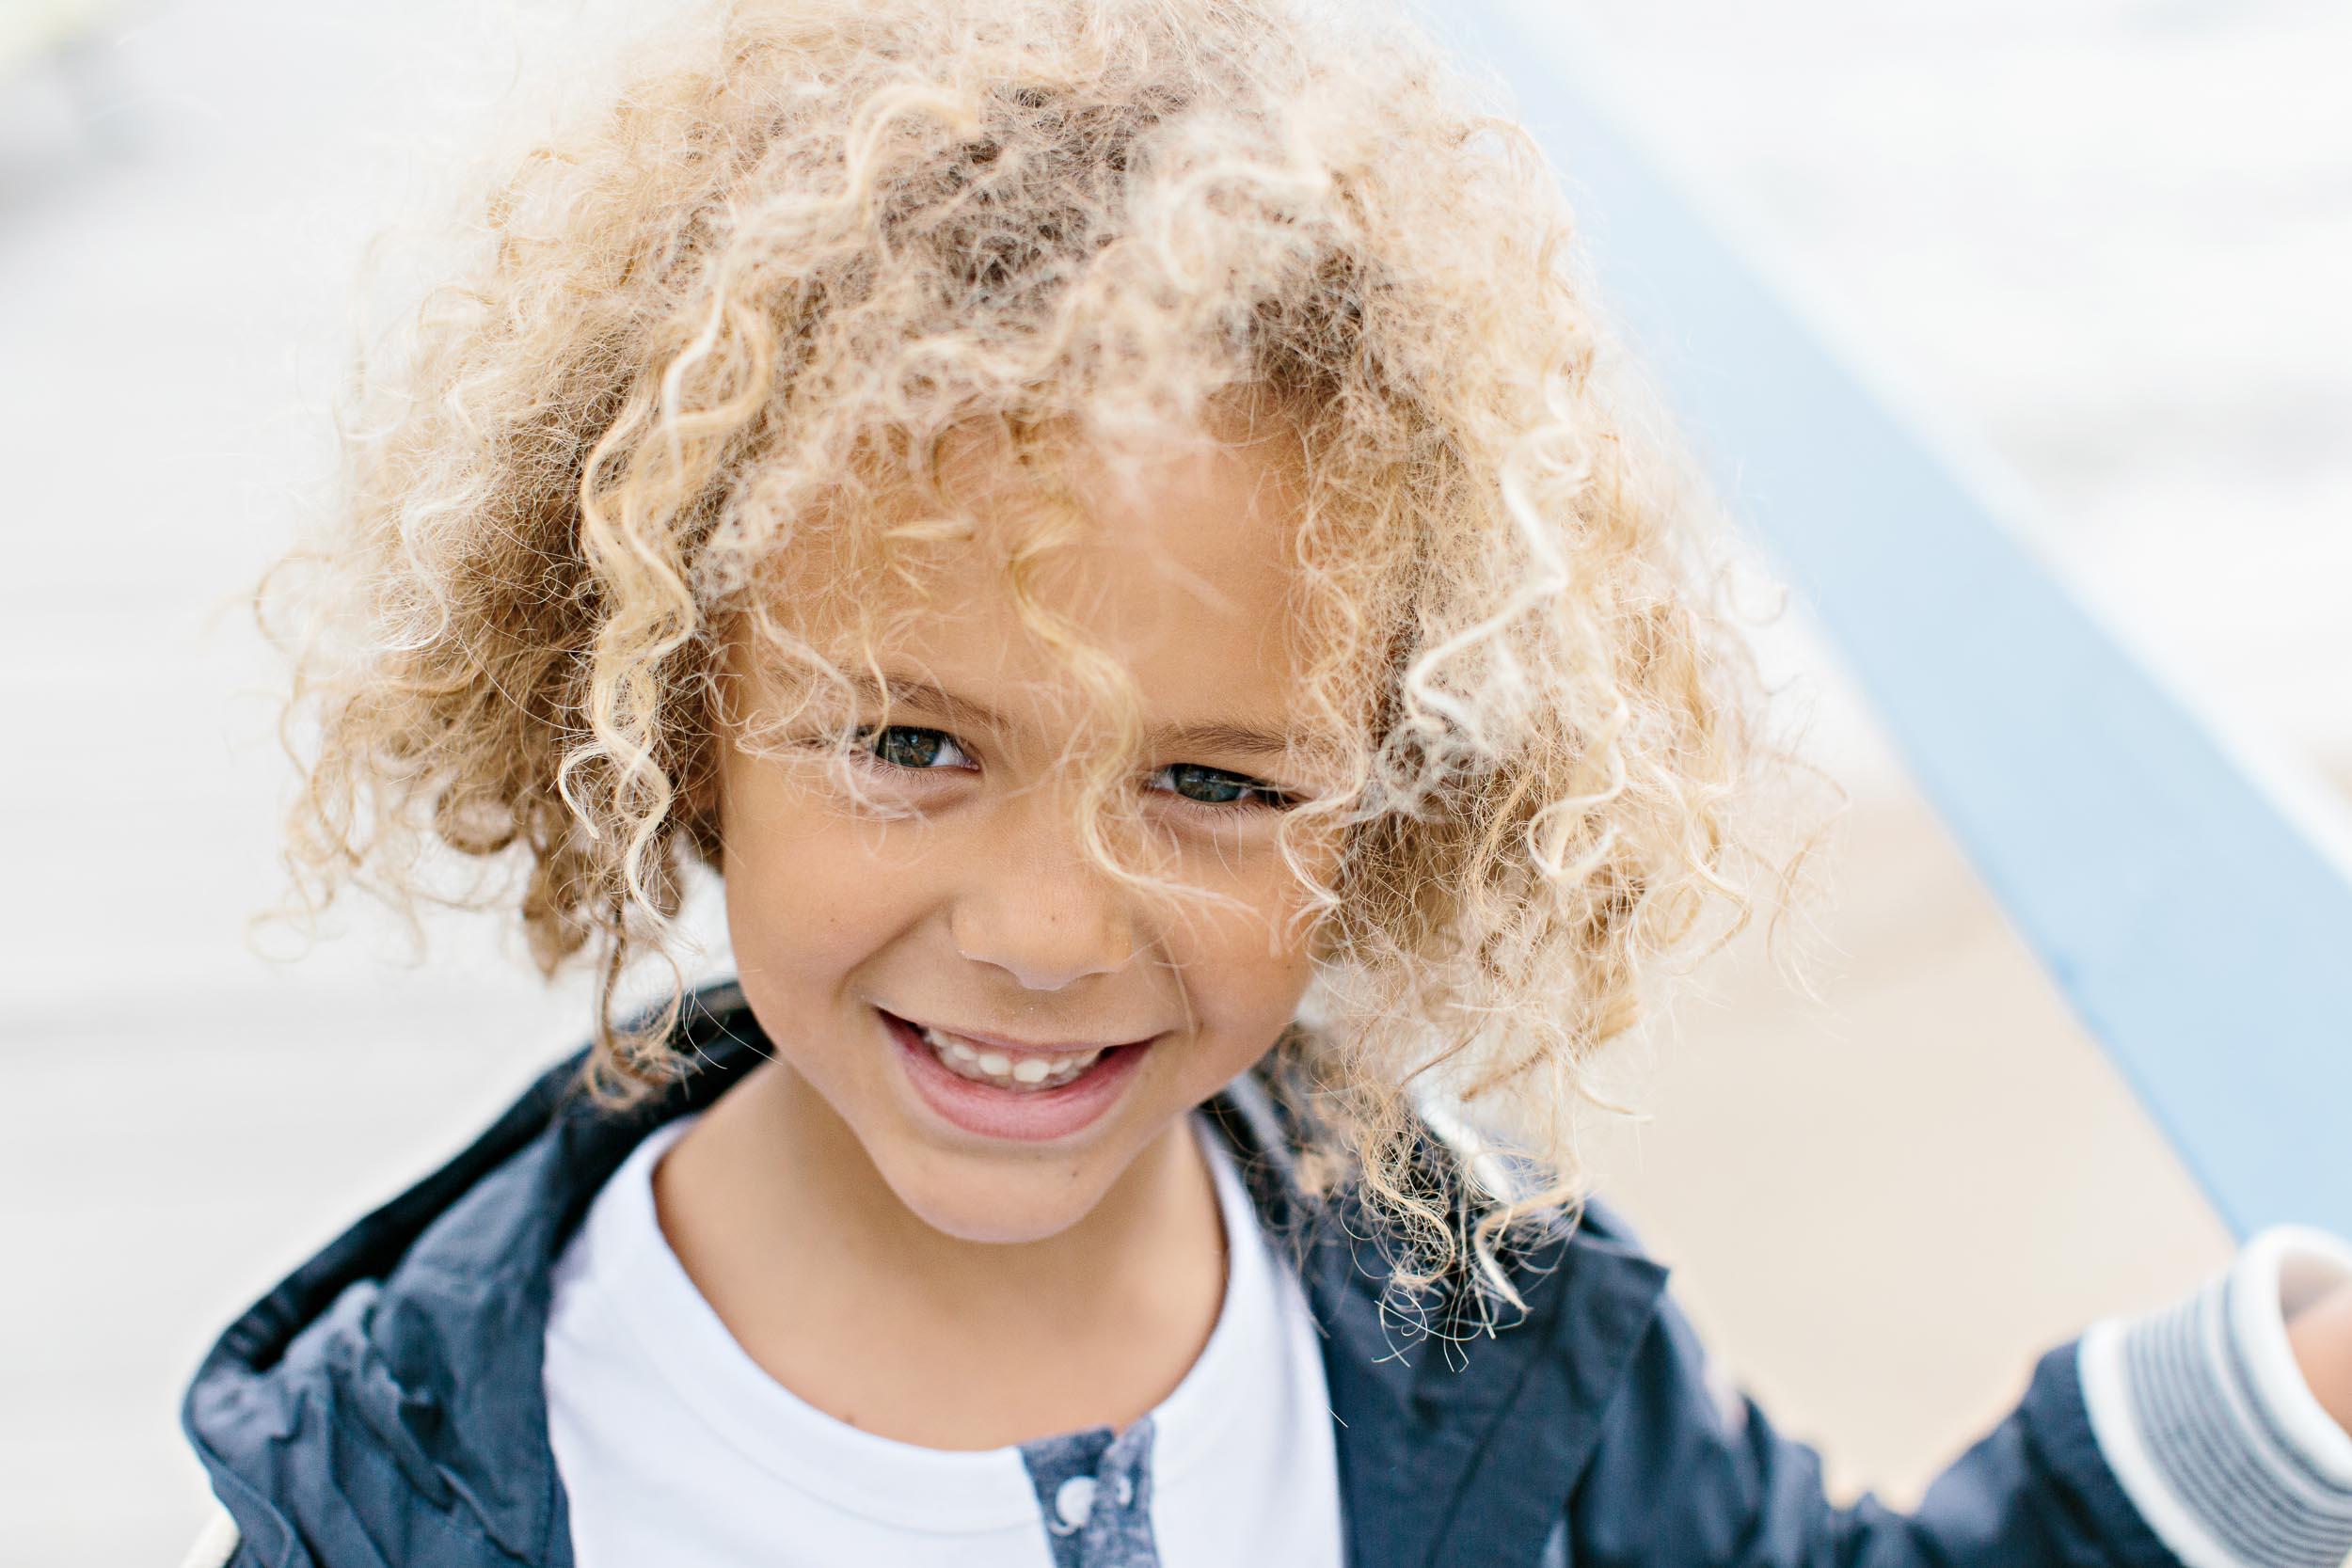 Kas-Richards-LENZO_Betts-Kids-Shoes-264.jpg